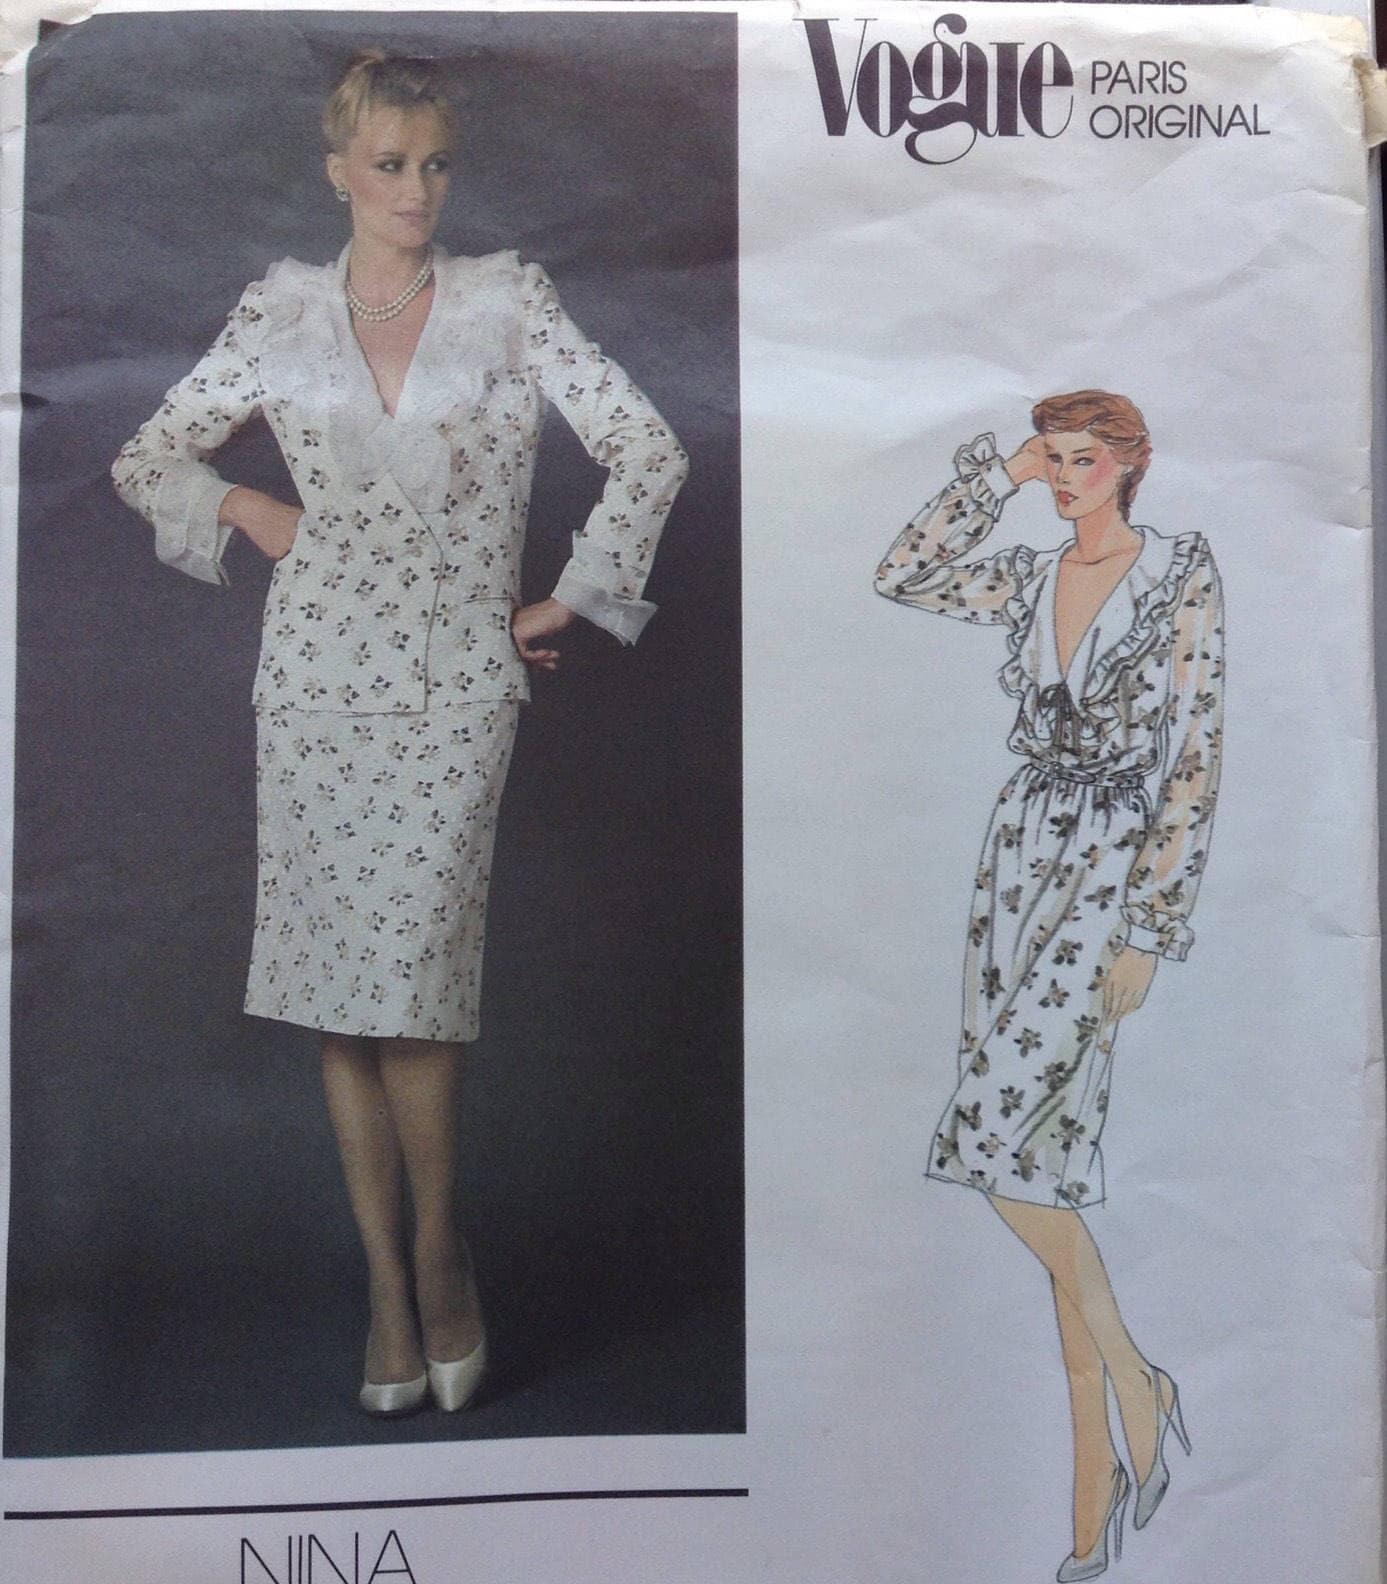 c9b681a853 Dazzyling Designer summer suit ensemble Vogue sewing pattern from  Followlight on Etsy Studio